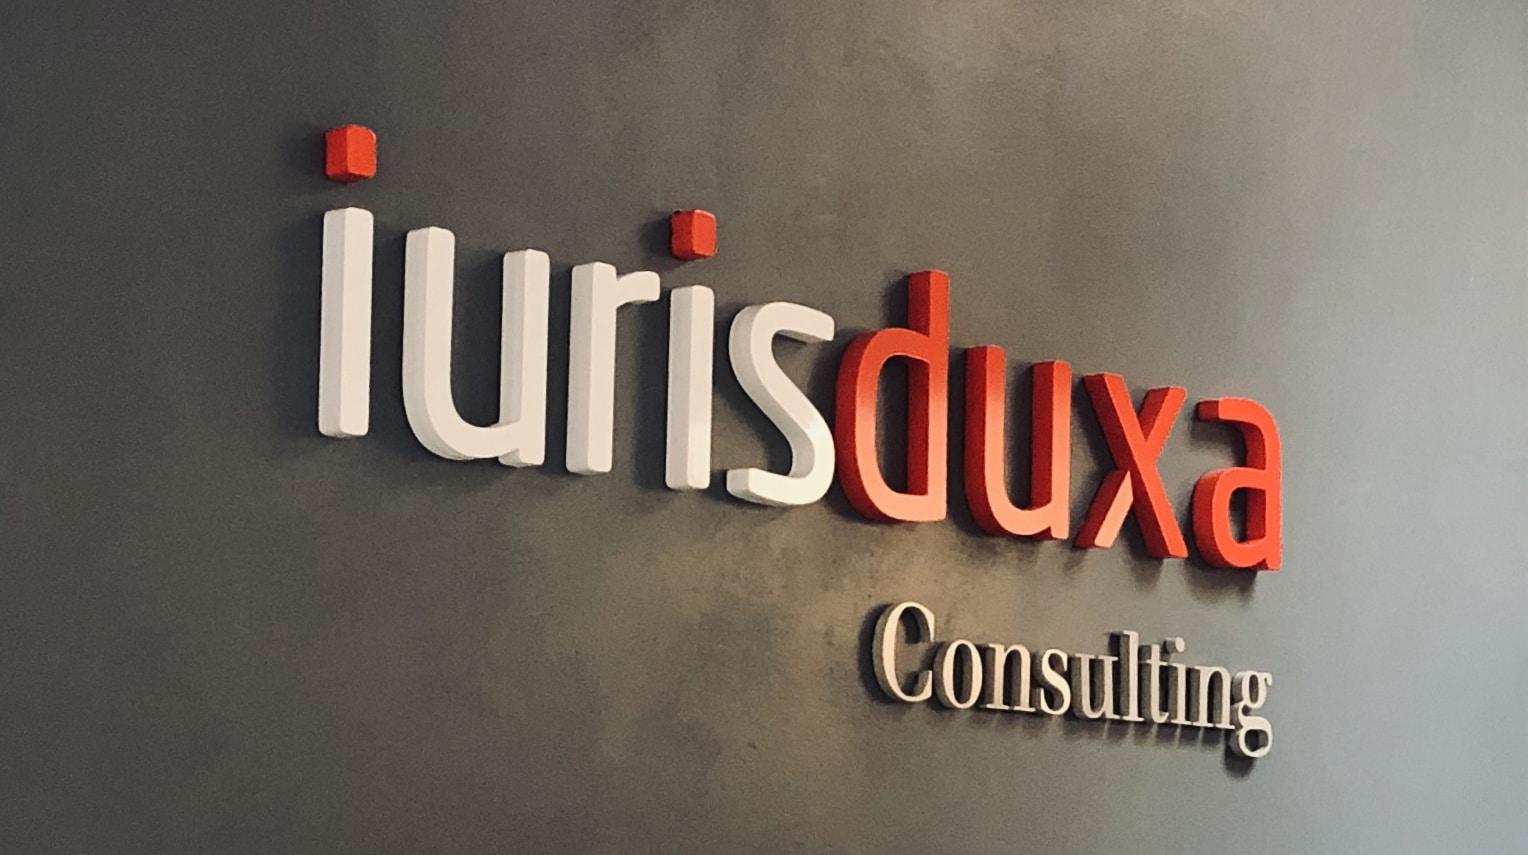 Diseño de marca Iurisduxa